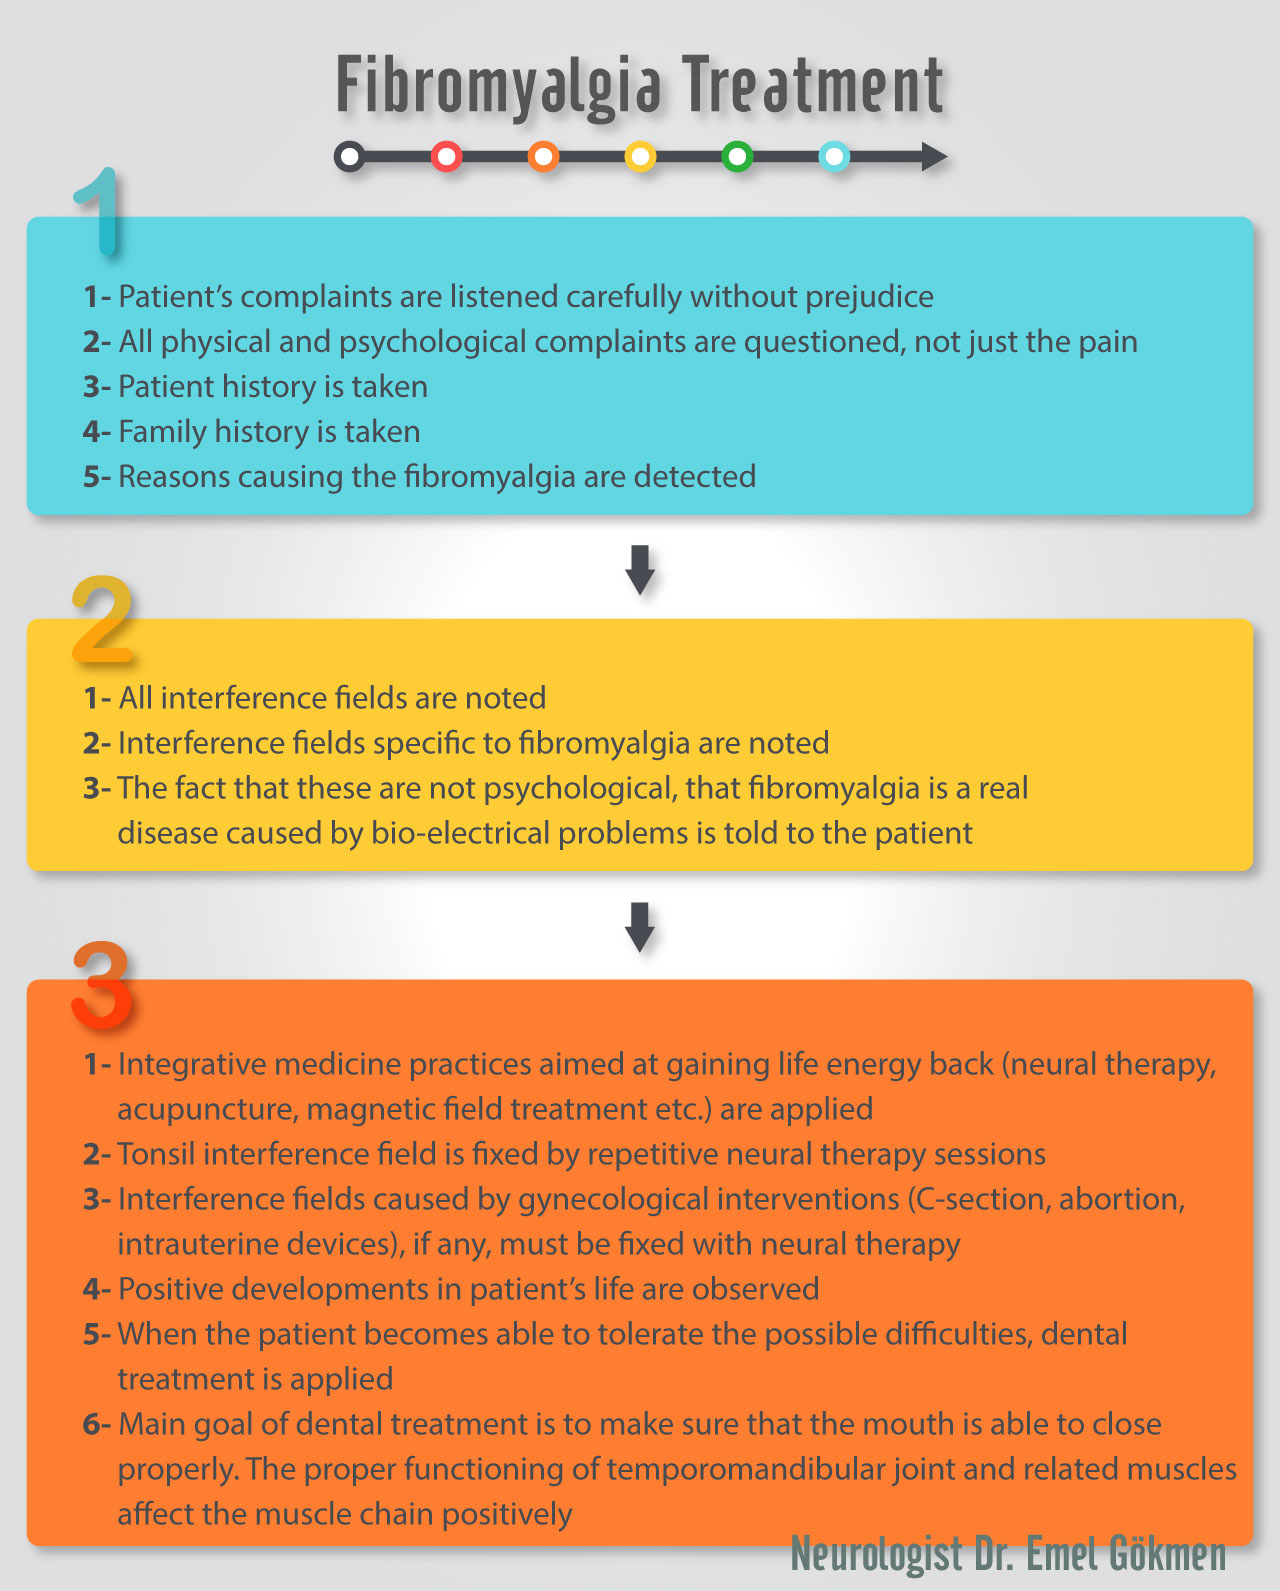 Fibromyalgia treatment infographic Dr. Emel Gokmen